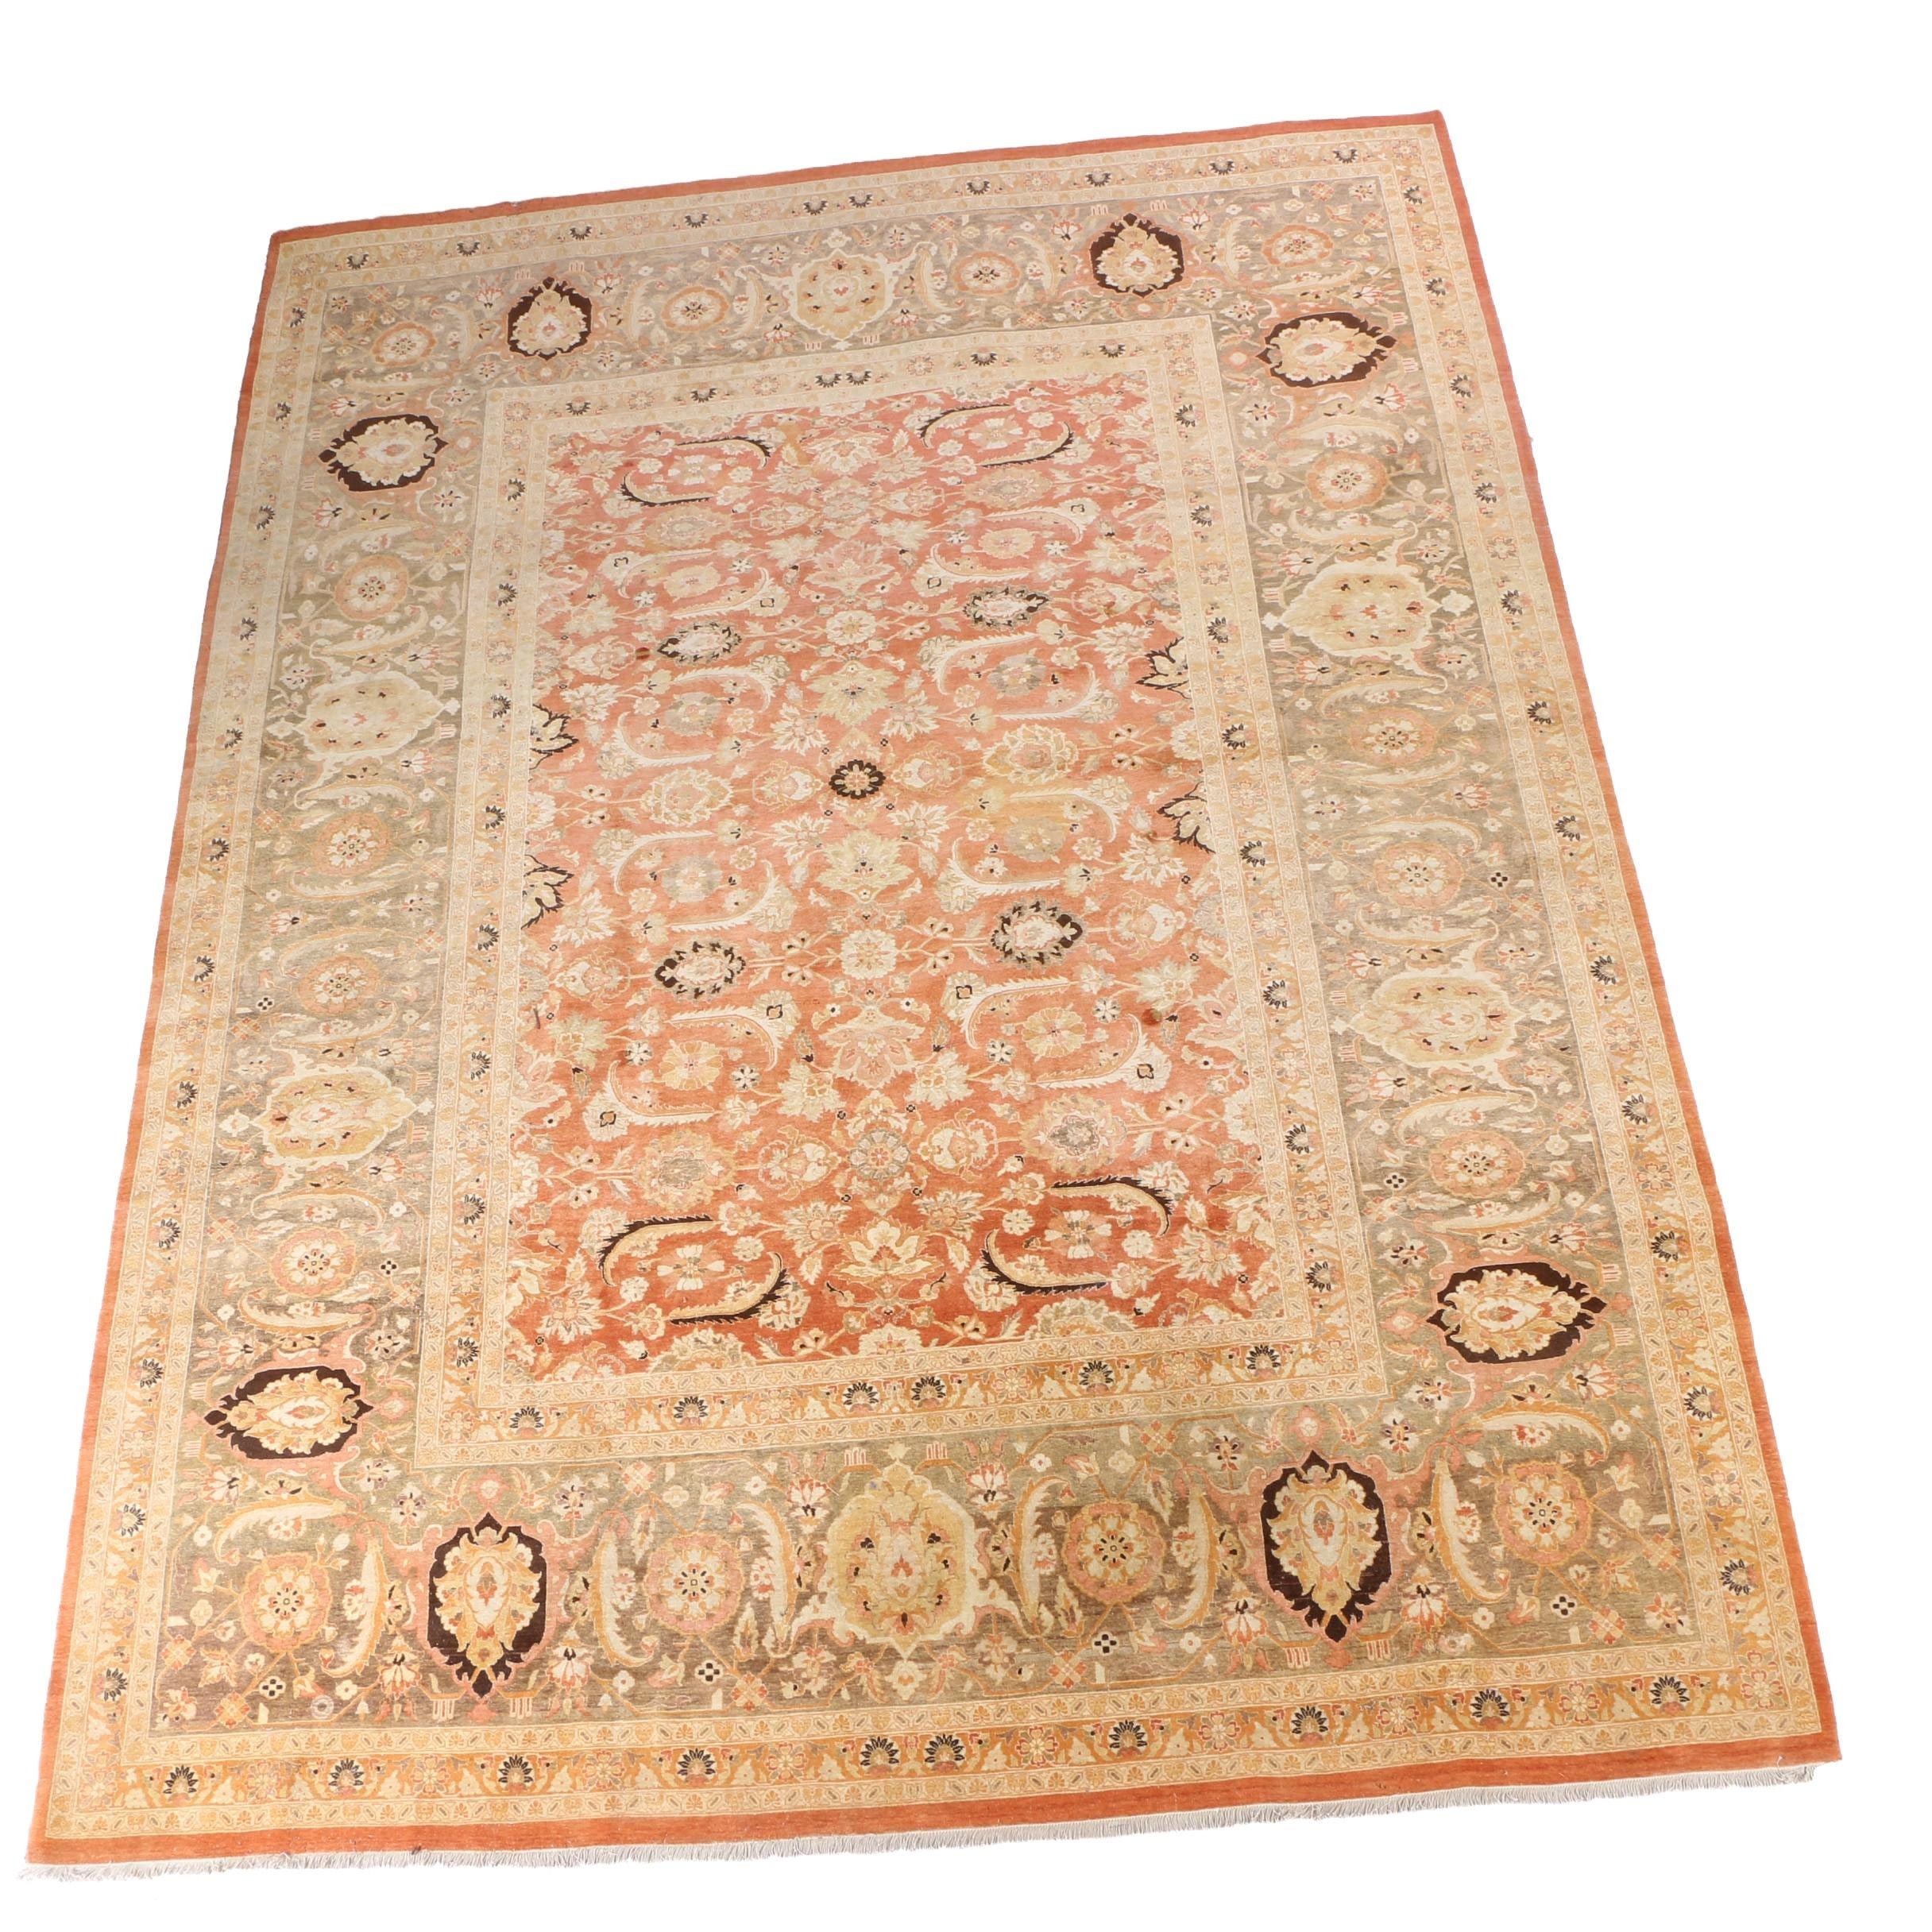 Hand-Knotted Pakistani Peshawar Room Sized Carpet